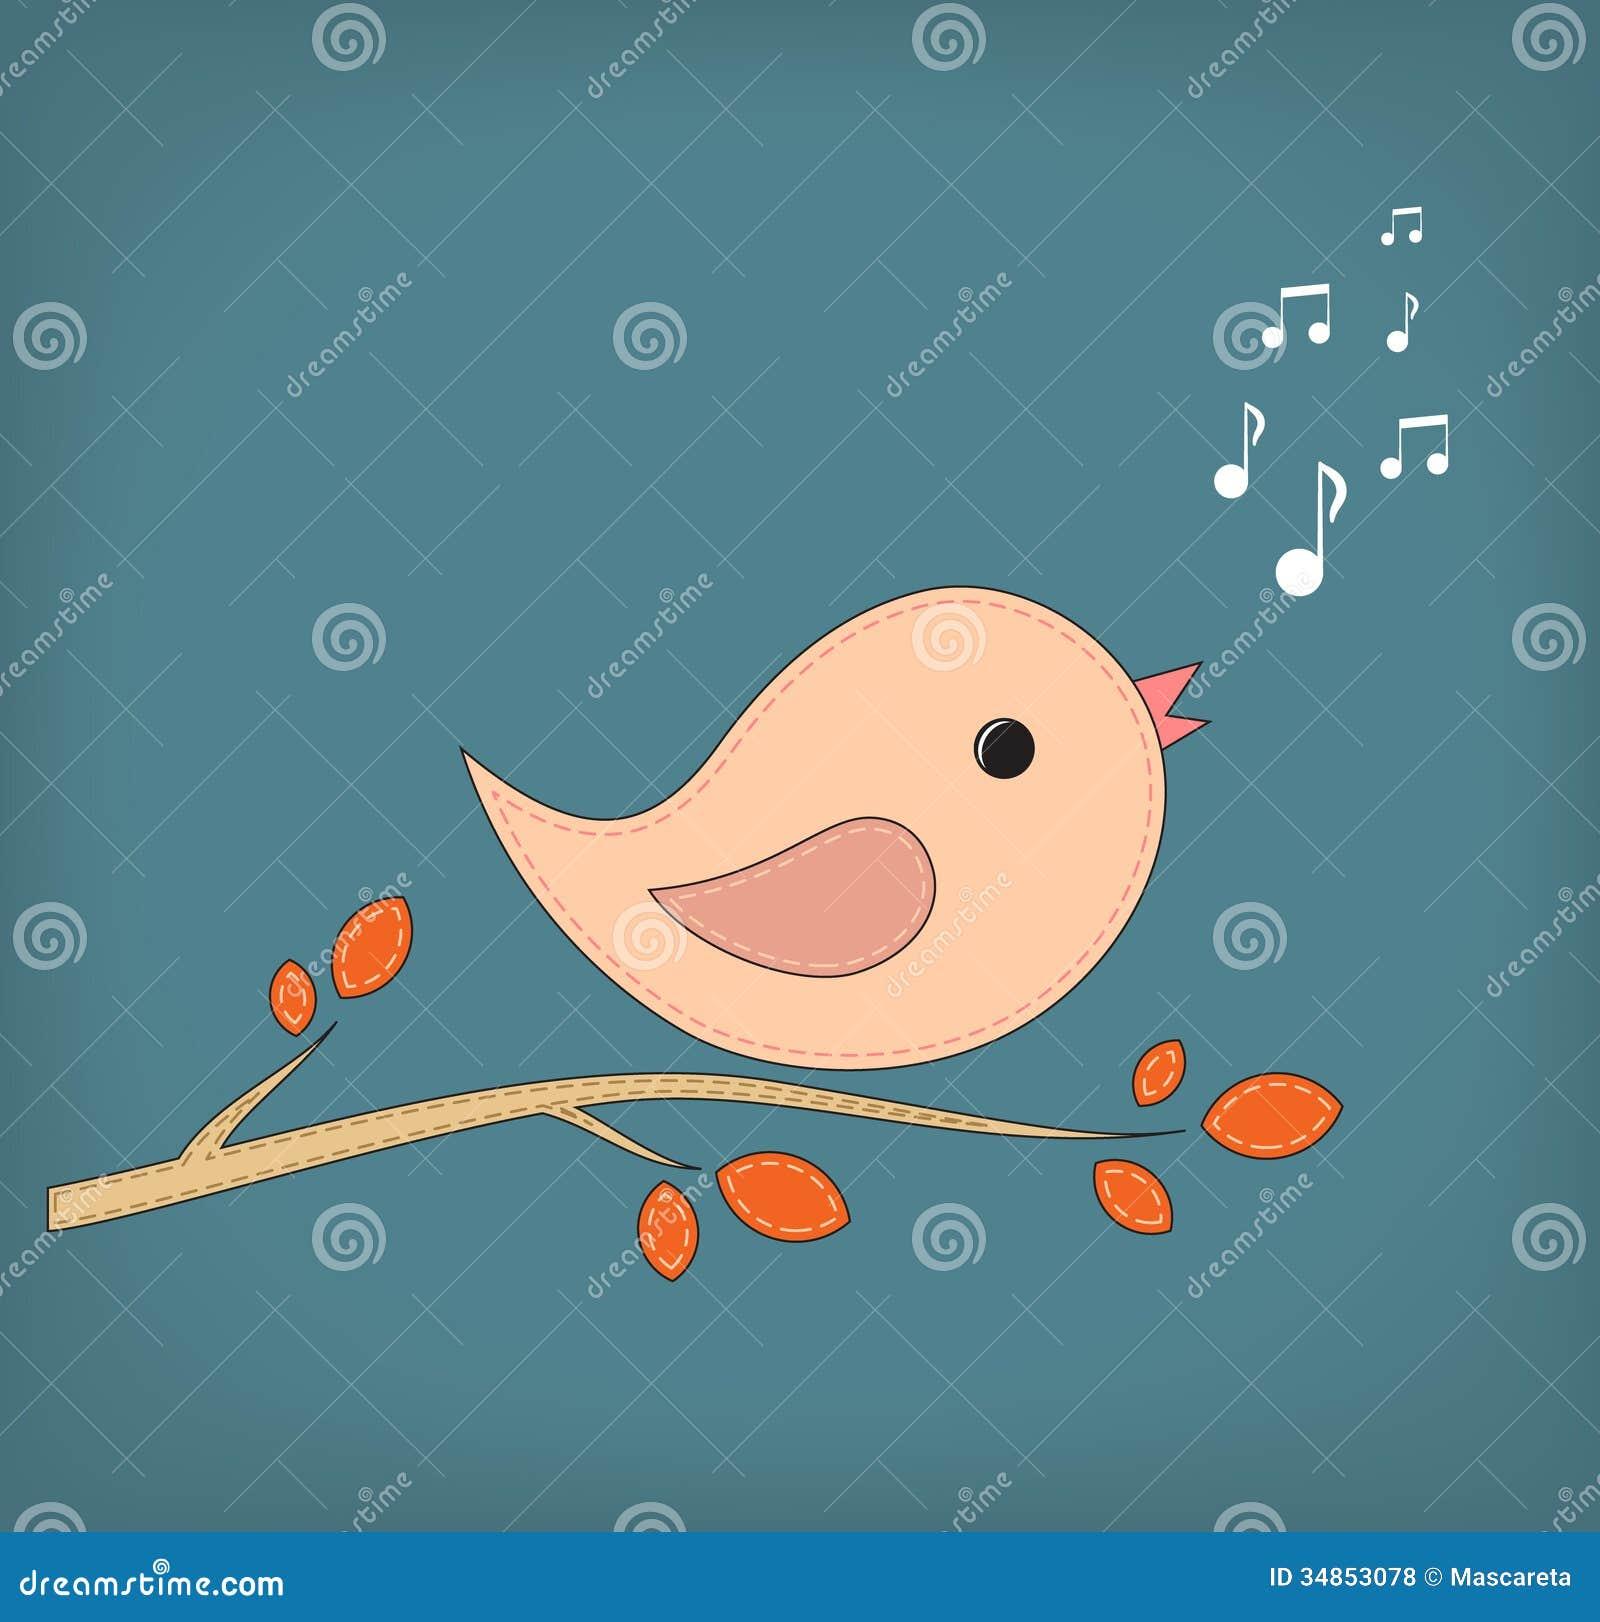 cartoon bird simple photo - photo #46